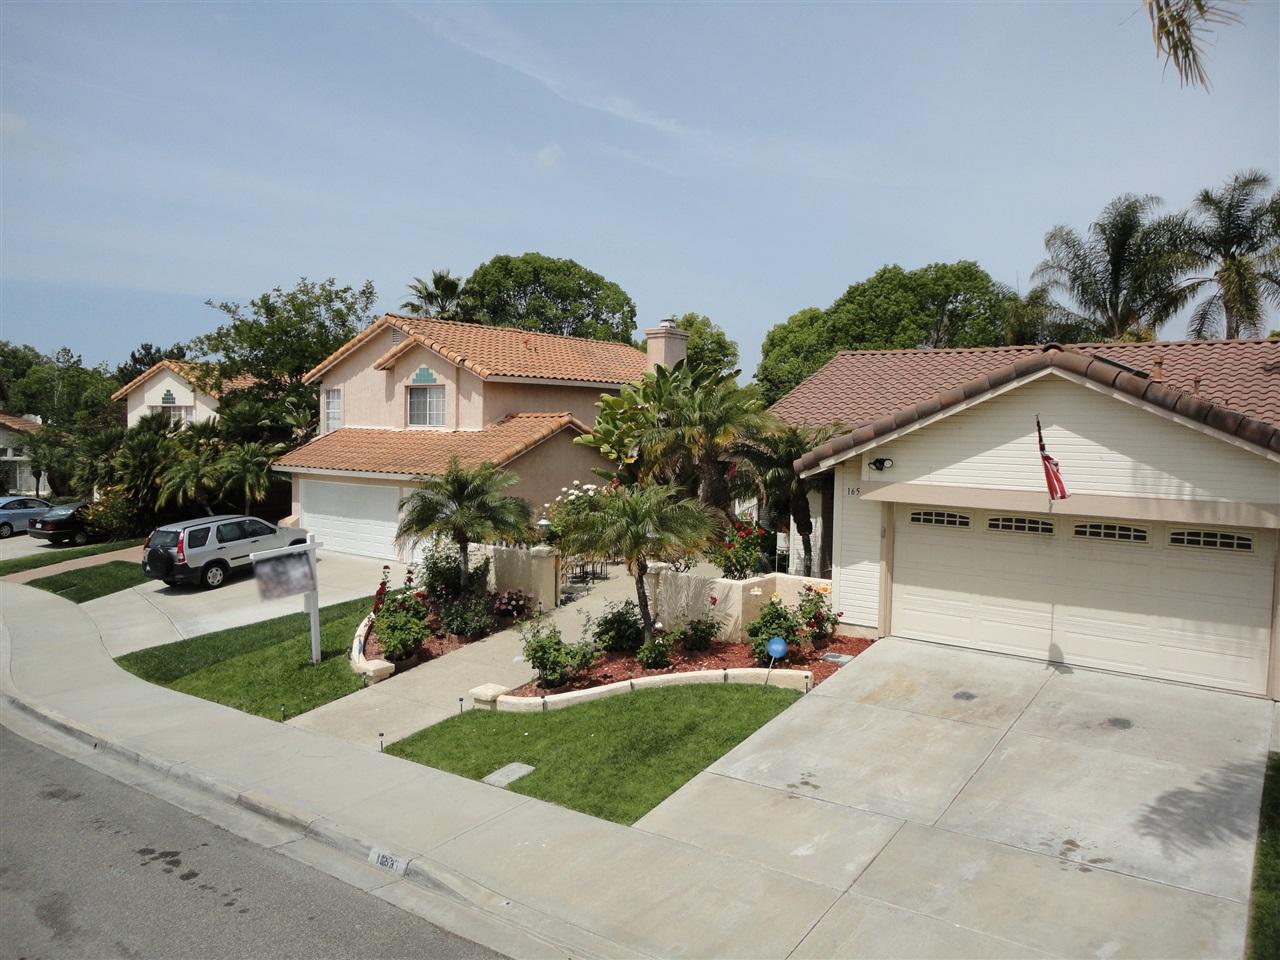 1653 Avenida Oceano, Oceanside, CA